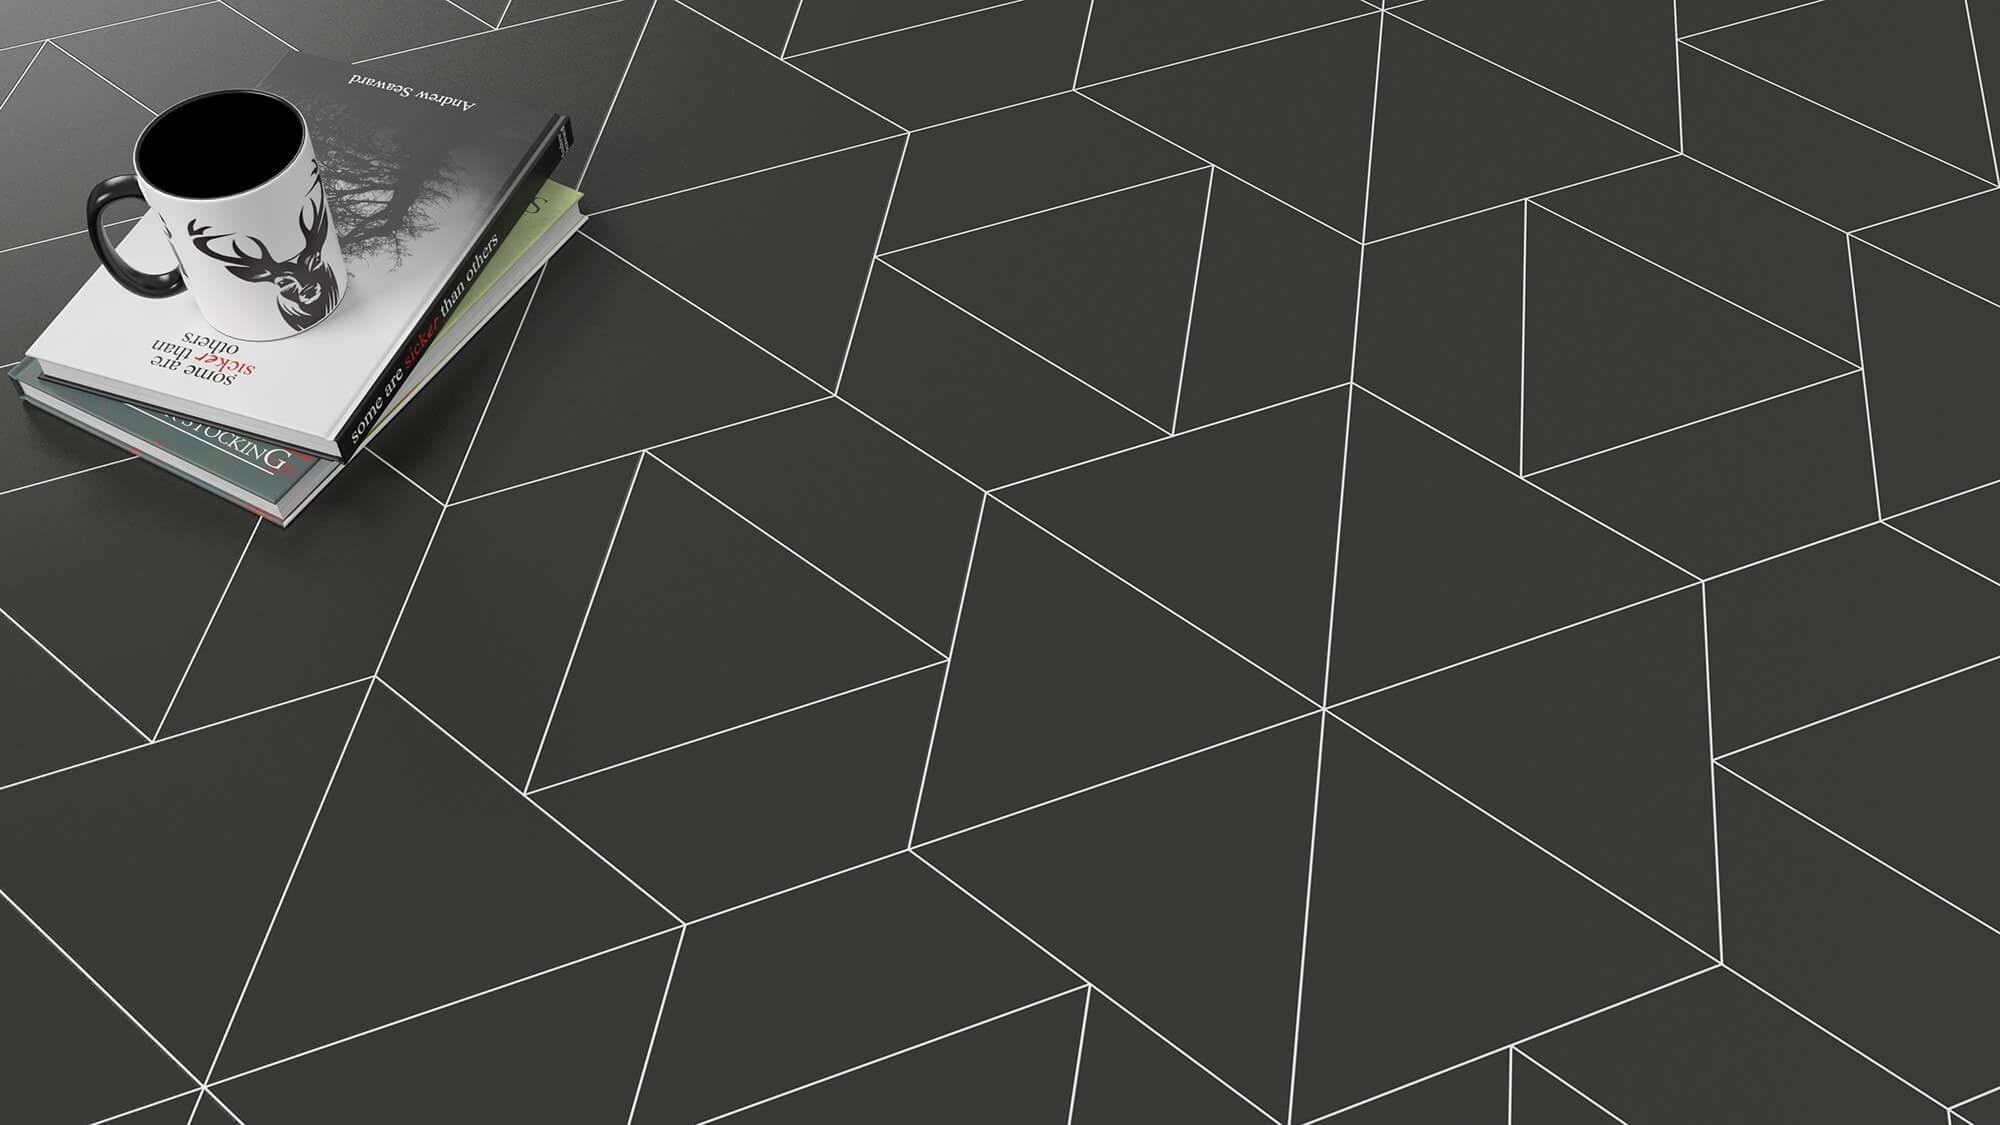 Vinyl and linoleum floor coverings with underfloor heating